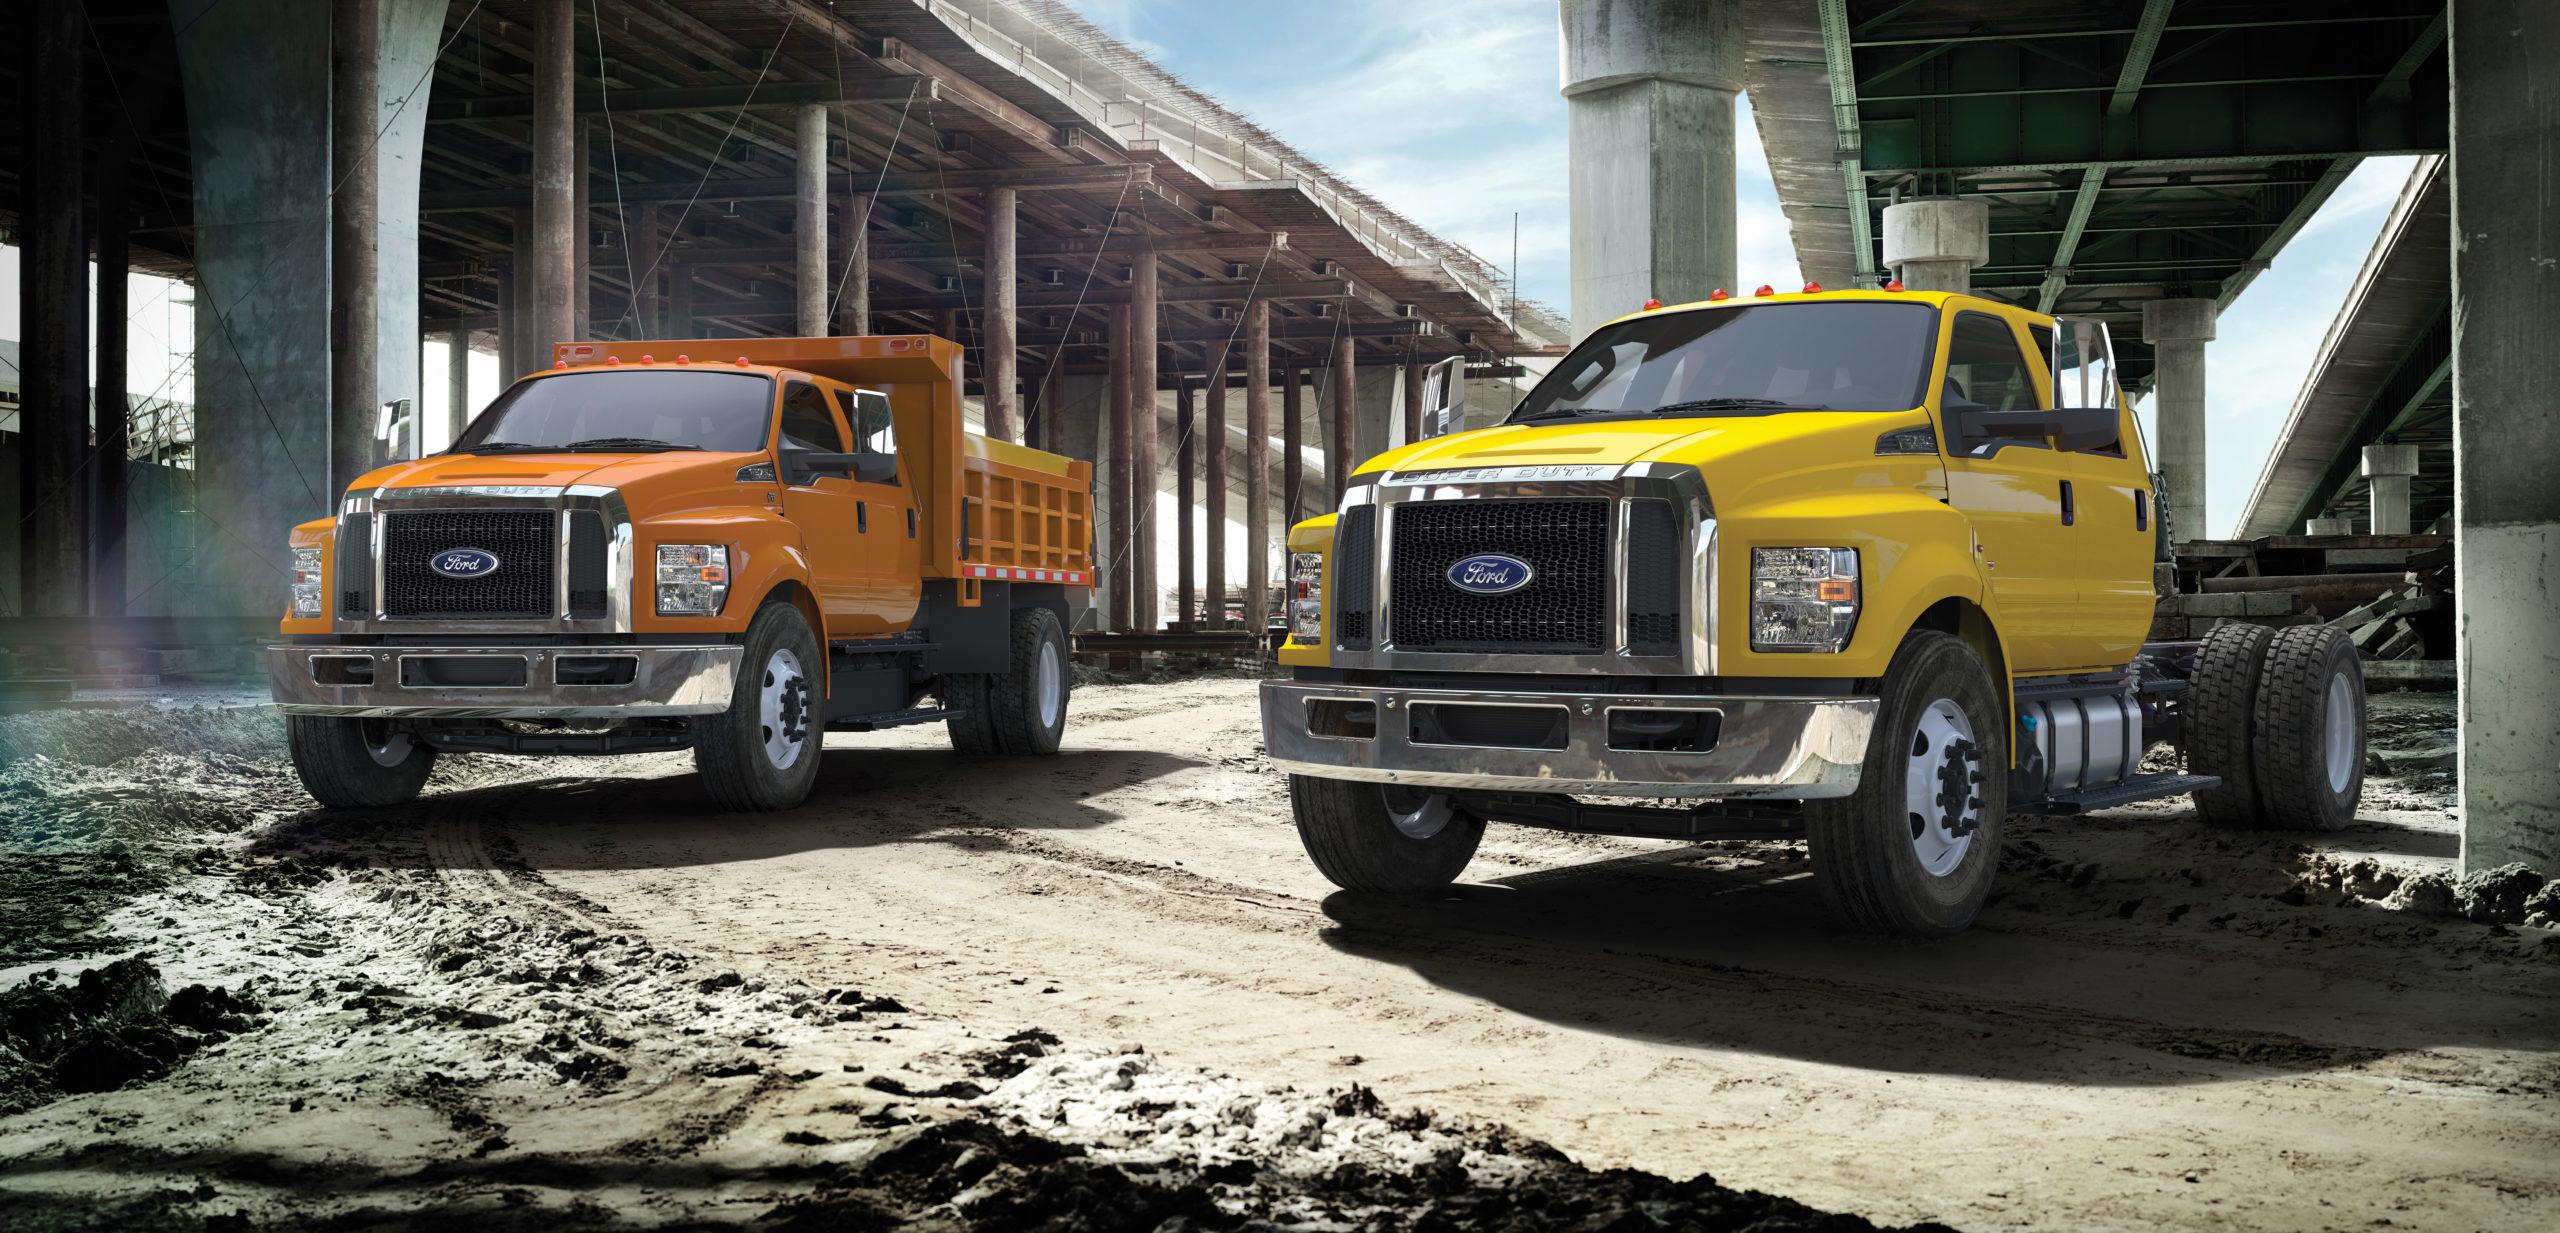 Ford Construction Fleet Trucks